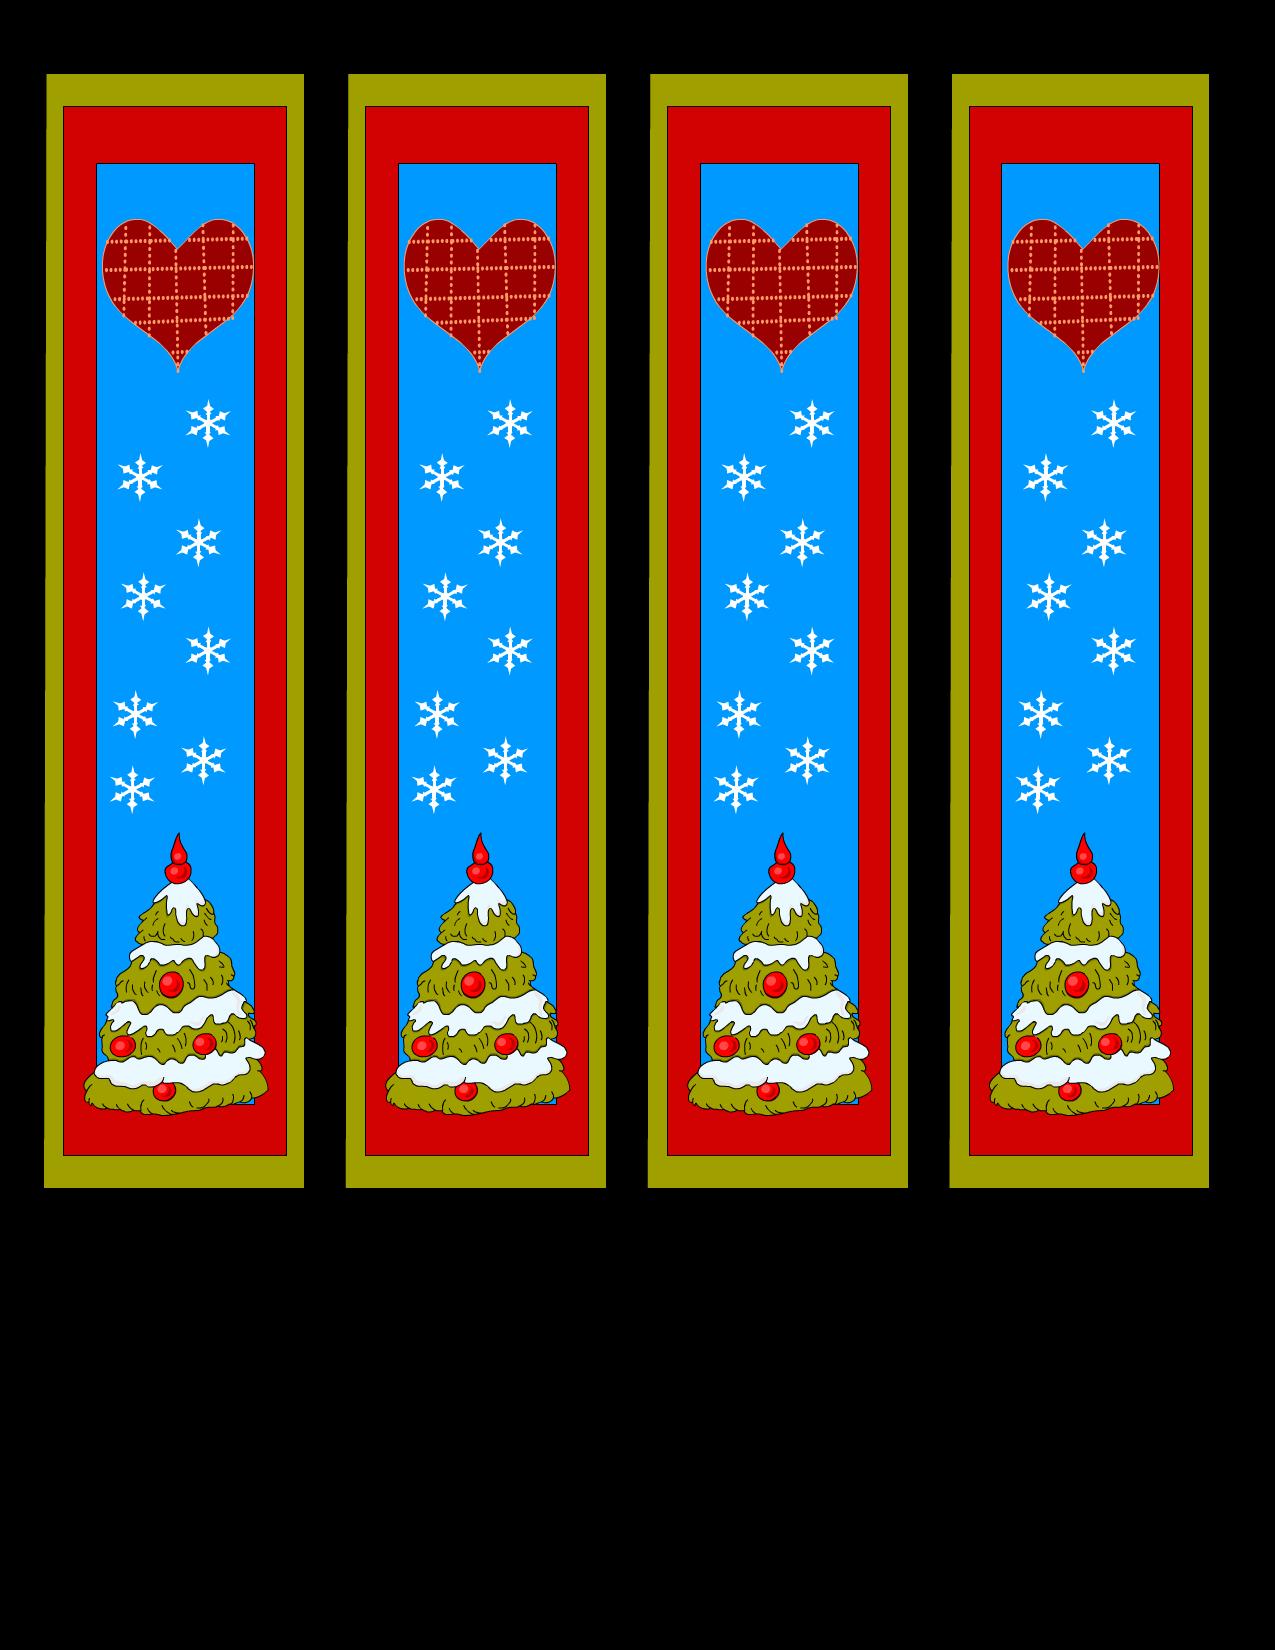 Book mark clipart vector transparent Free Printable Christmas Bookmarks vector transparent